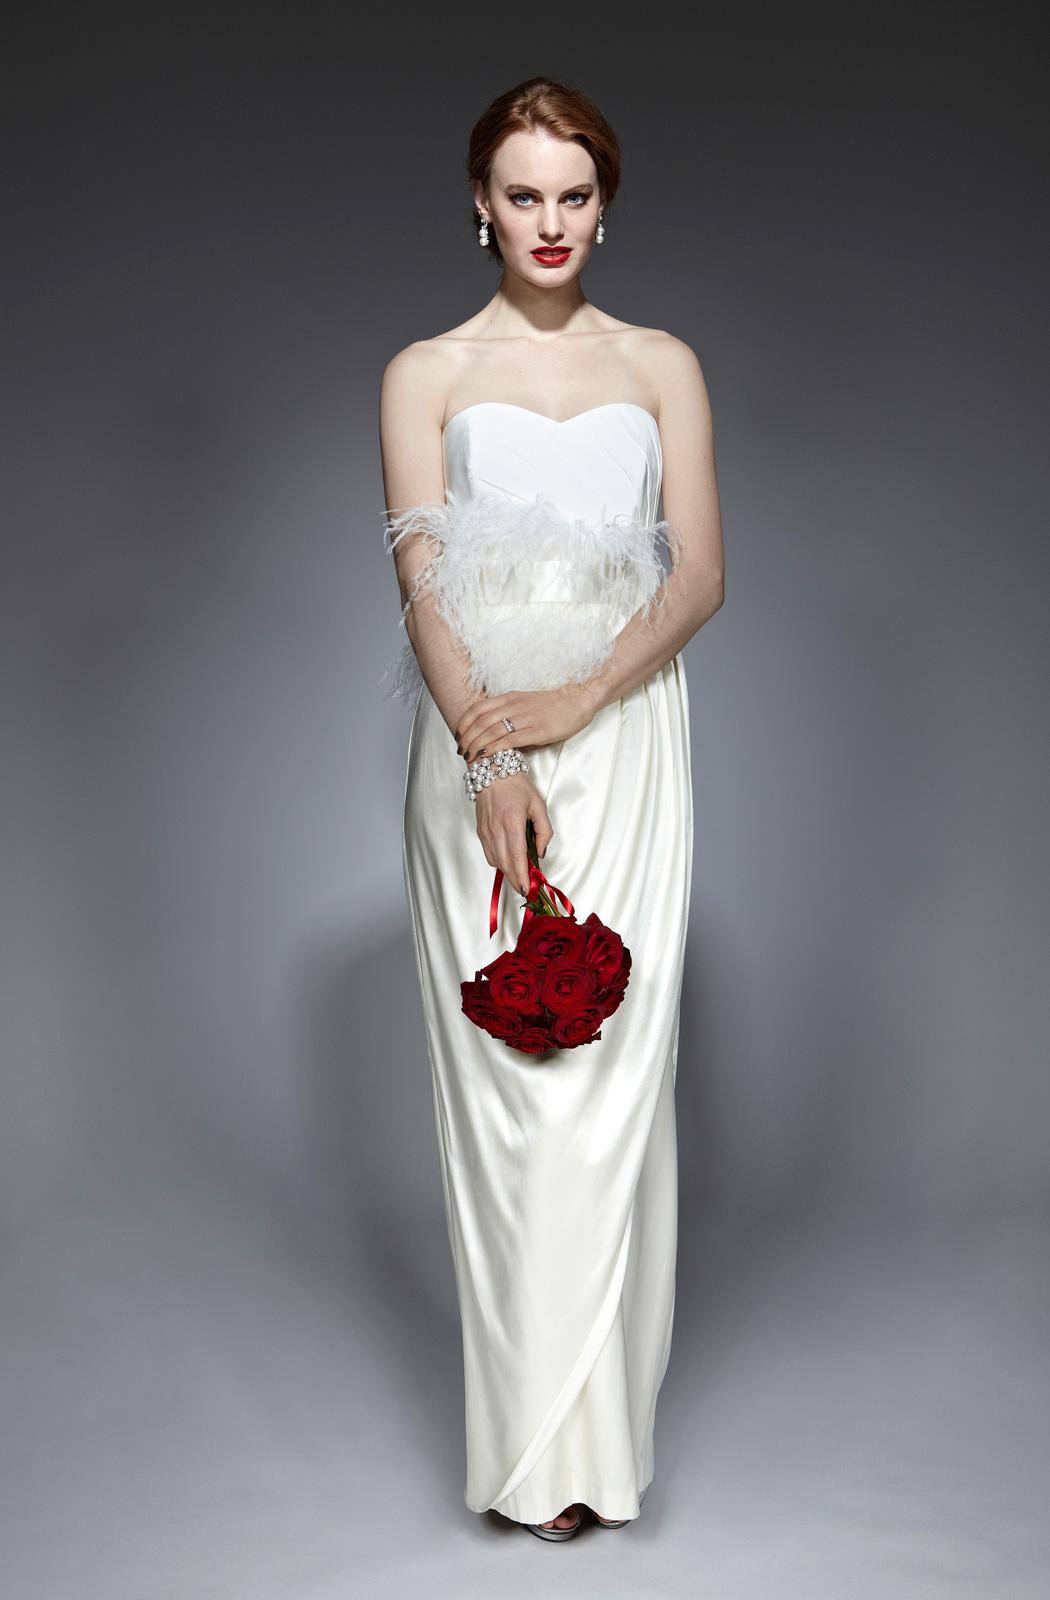 coast wedding dresses angelique maxi dress ZHCTIVR